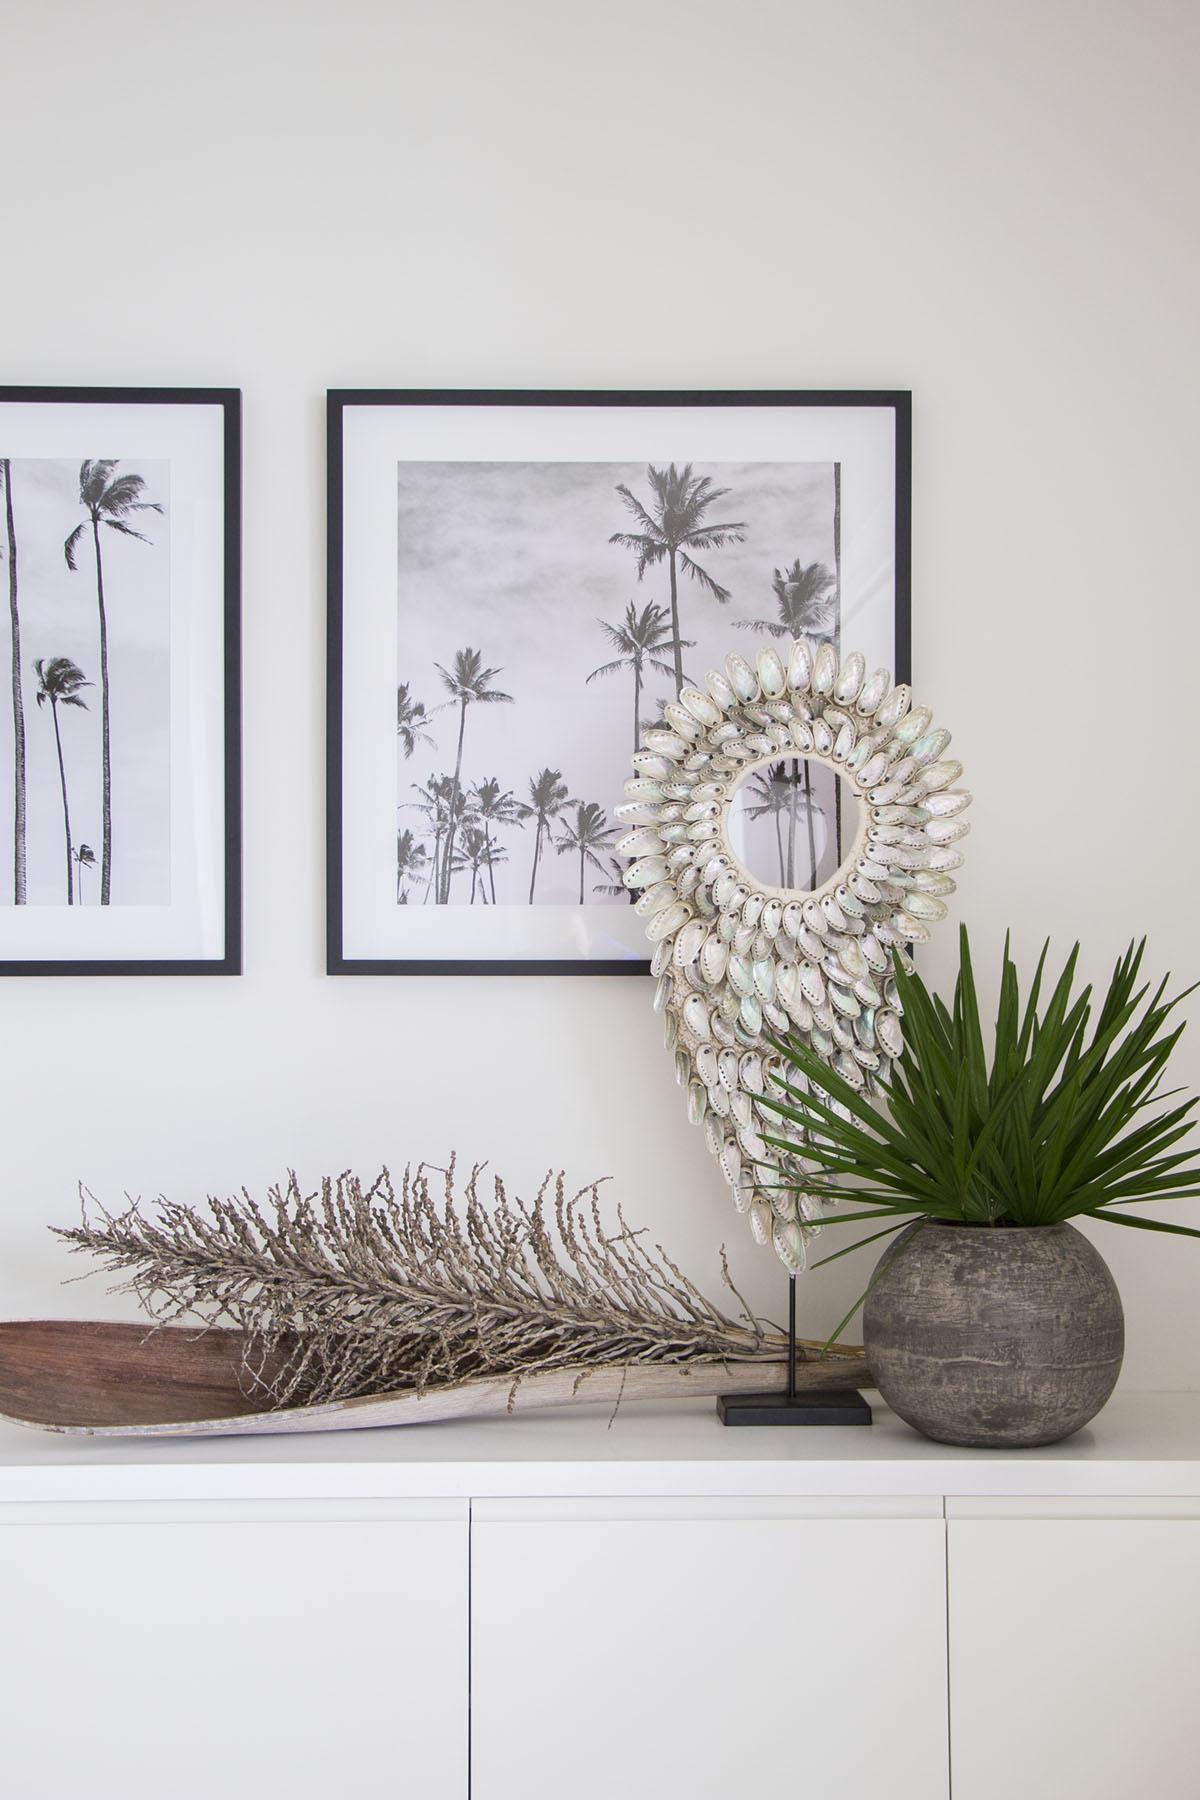 Design Scout - Interior Design - Jacinta Platt - Gold Coast Interior Designer - Photography by Tanika Blair - IMG_3357 - small.jpg